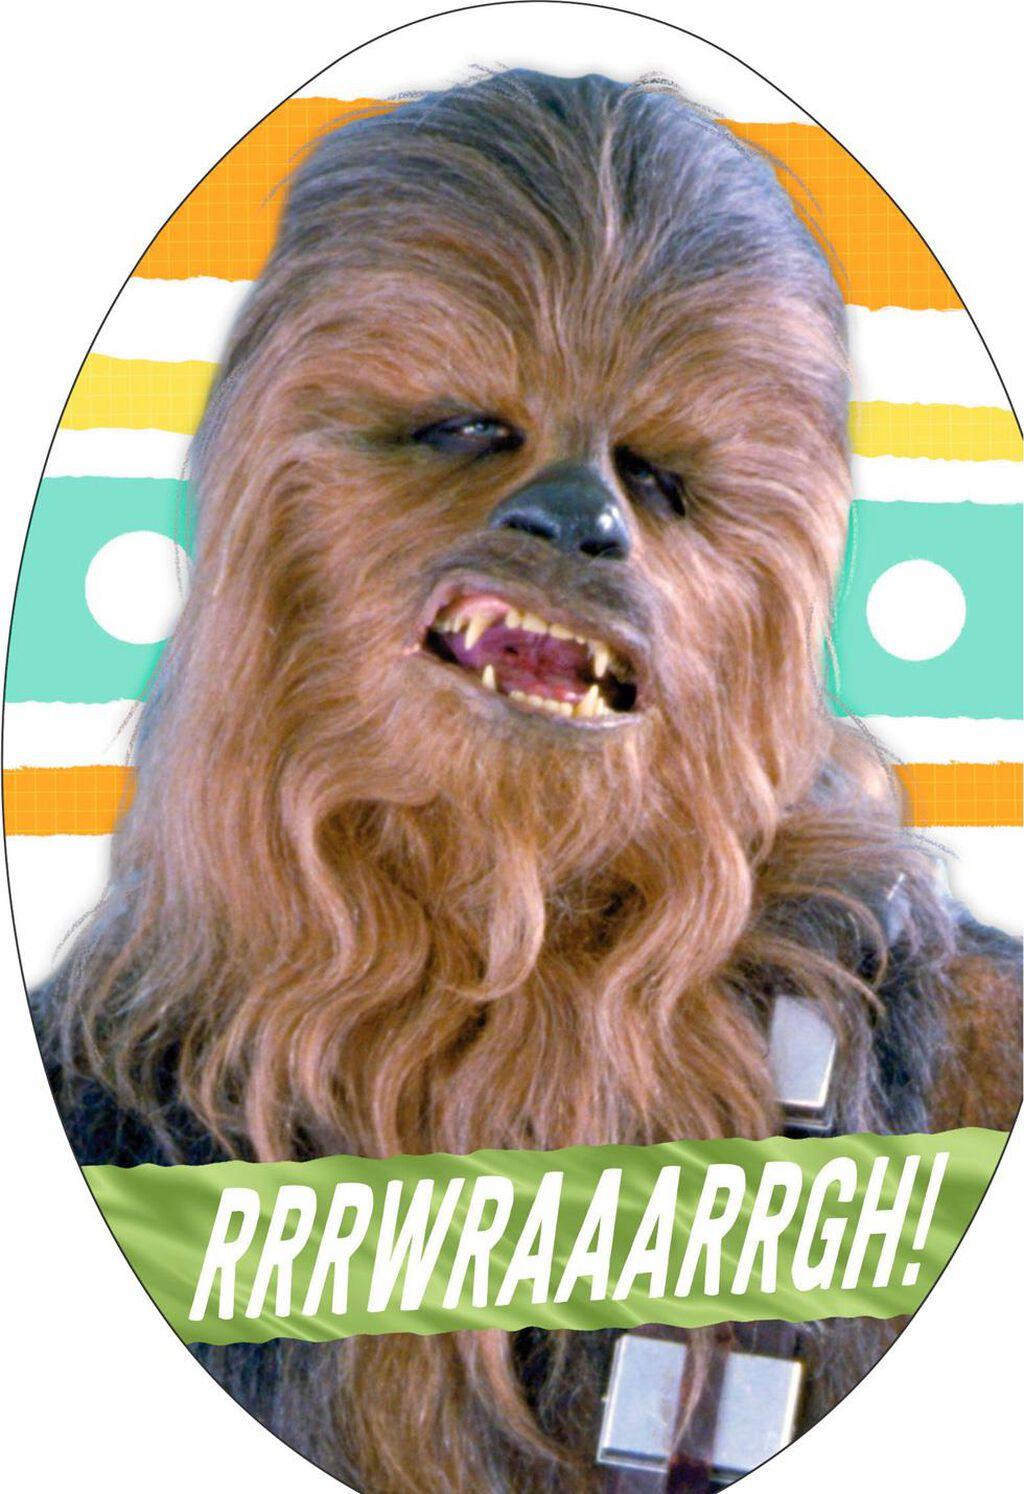 Star Wars™ Chewbacca™ Egg-Shaped Easter Card